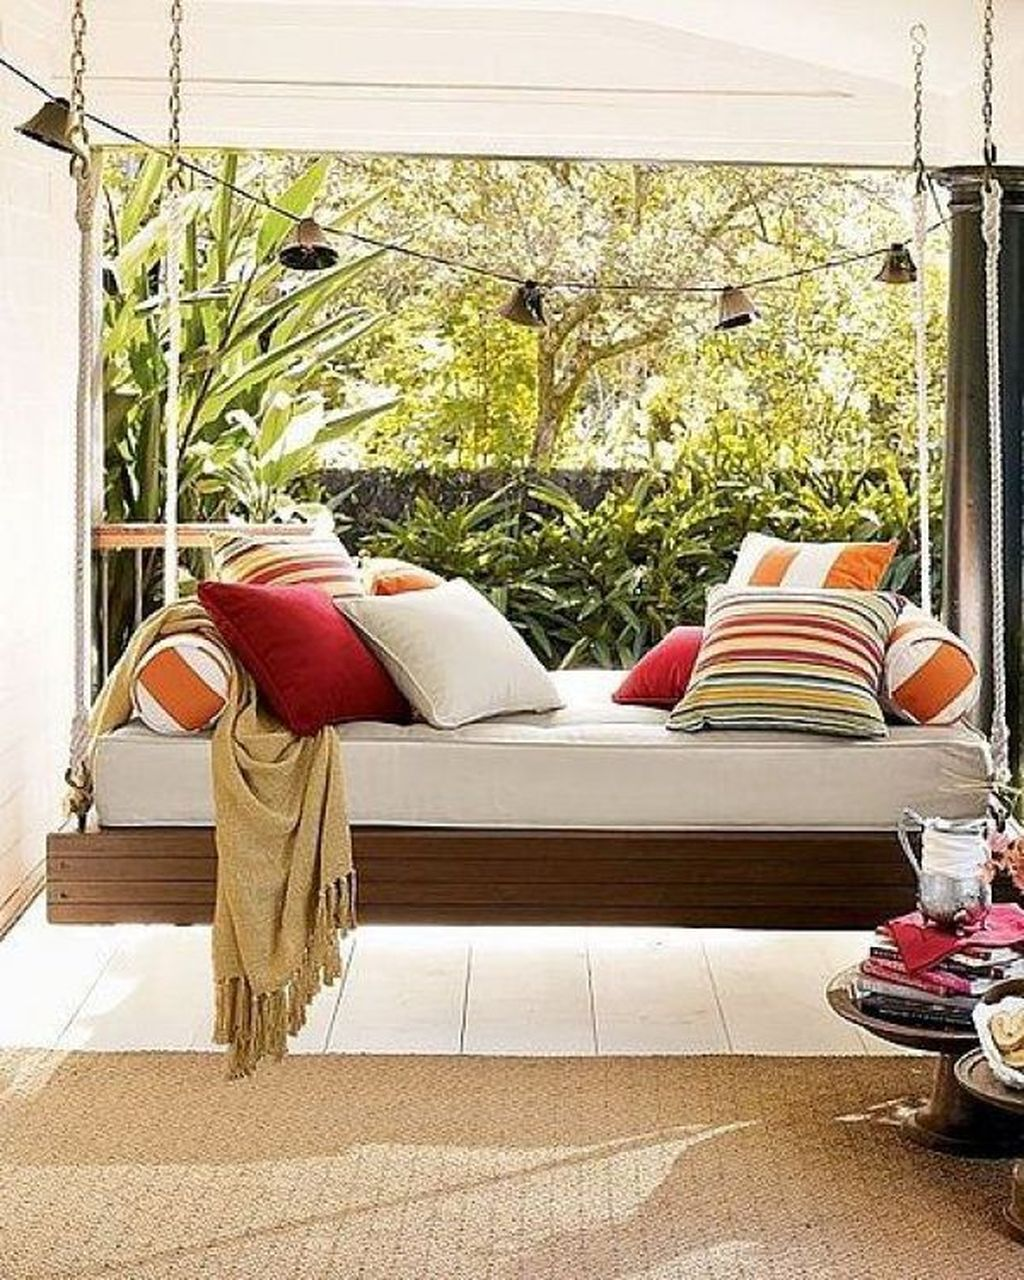 39 Fascinating Diy Outdoor Hanging Beds Design Ideas